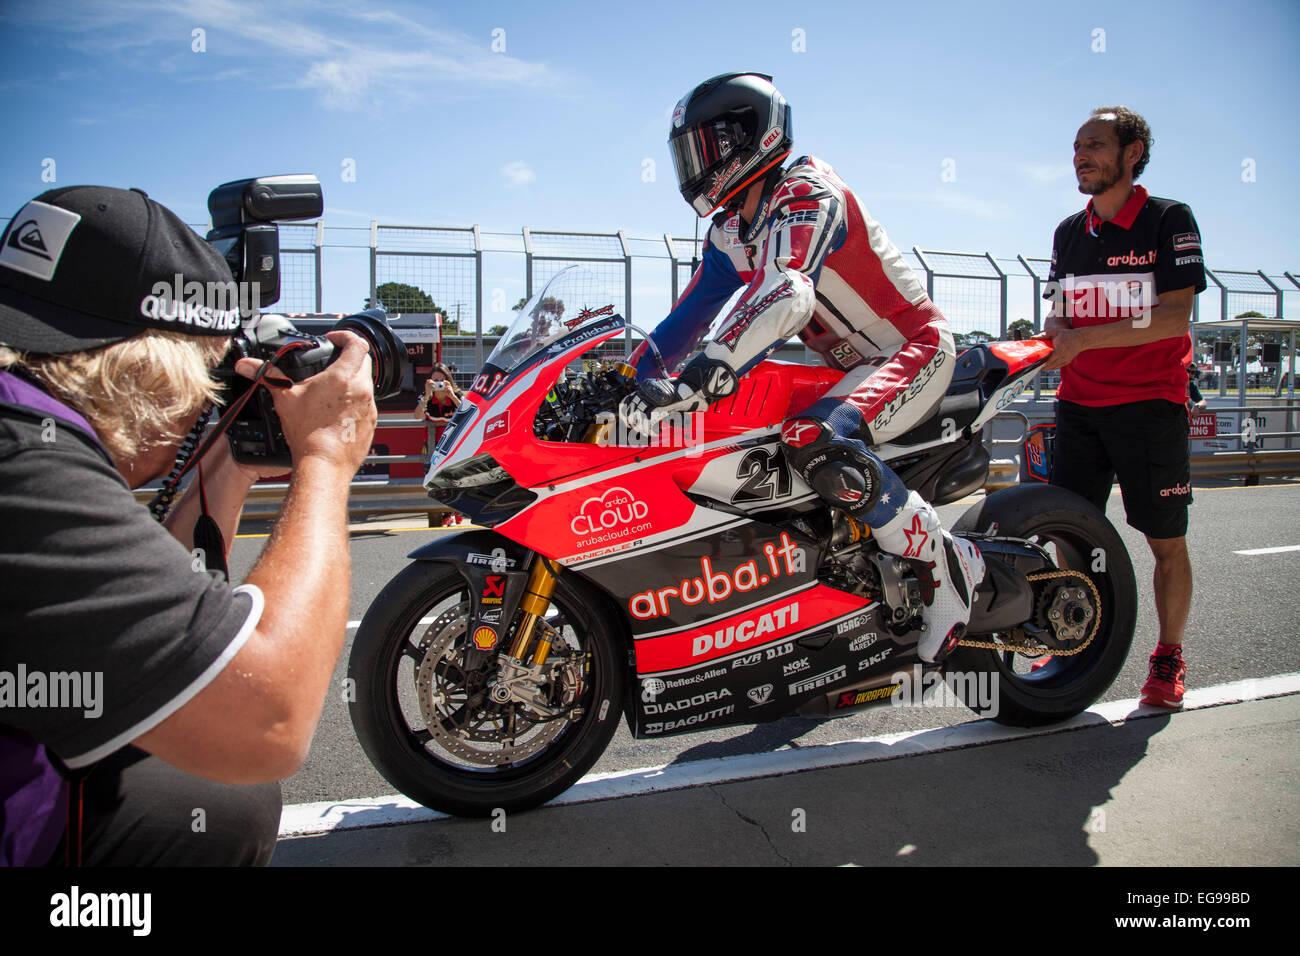 Ducati World Superbike Stock Photos & Ducati World Superbike